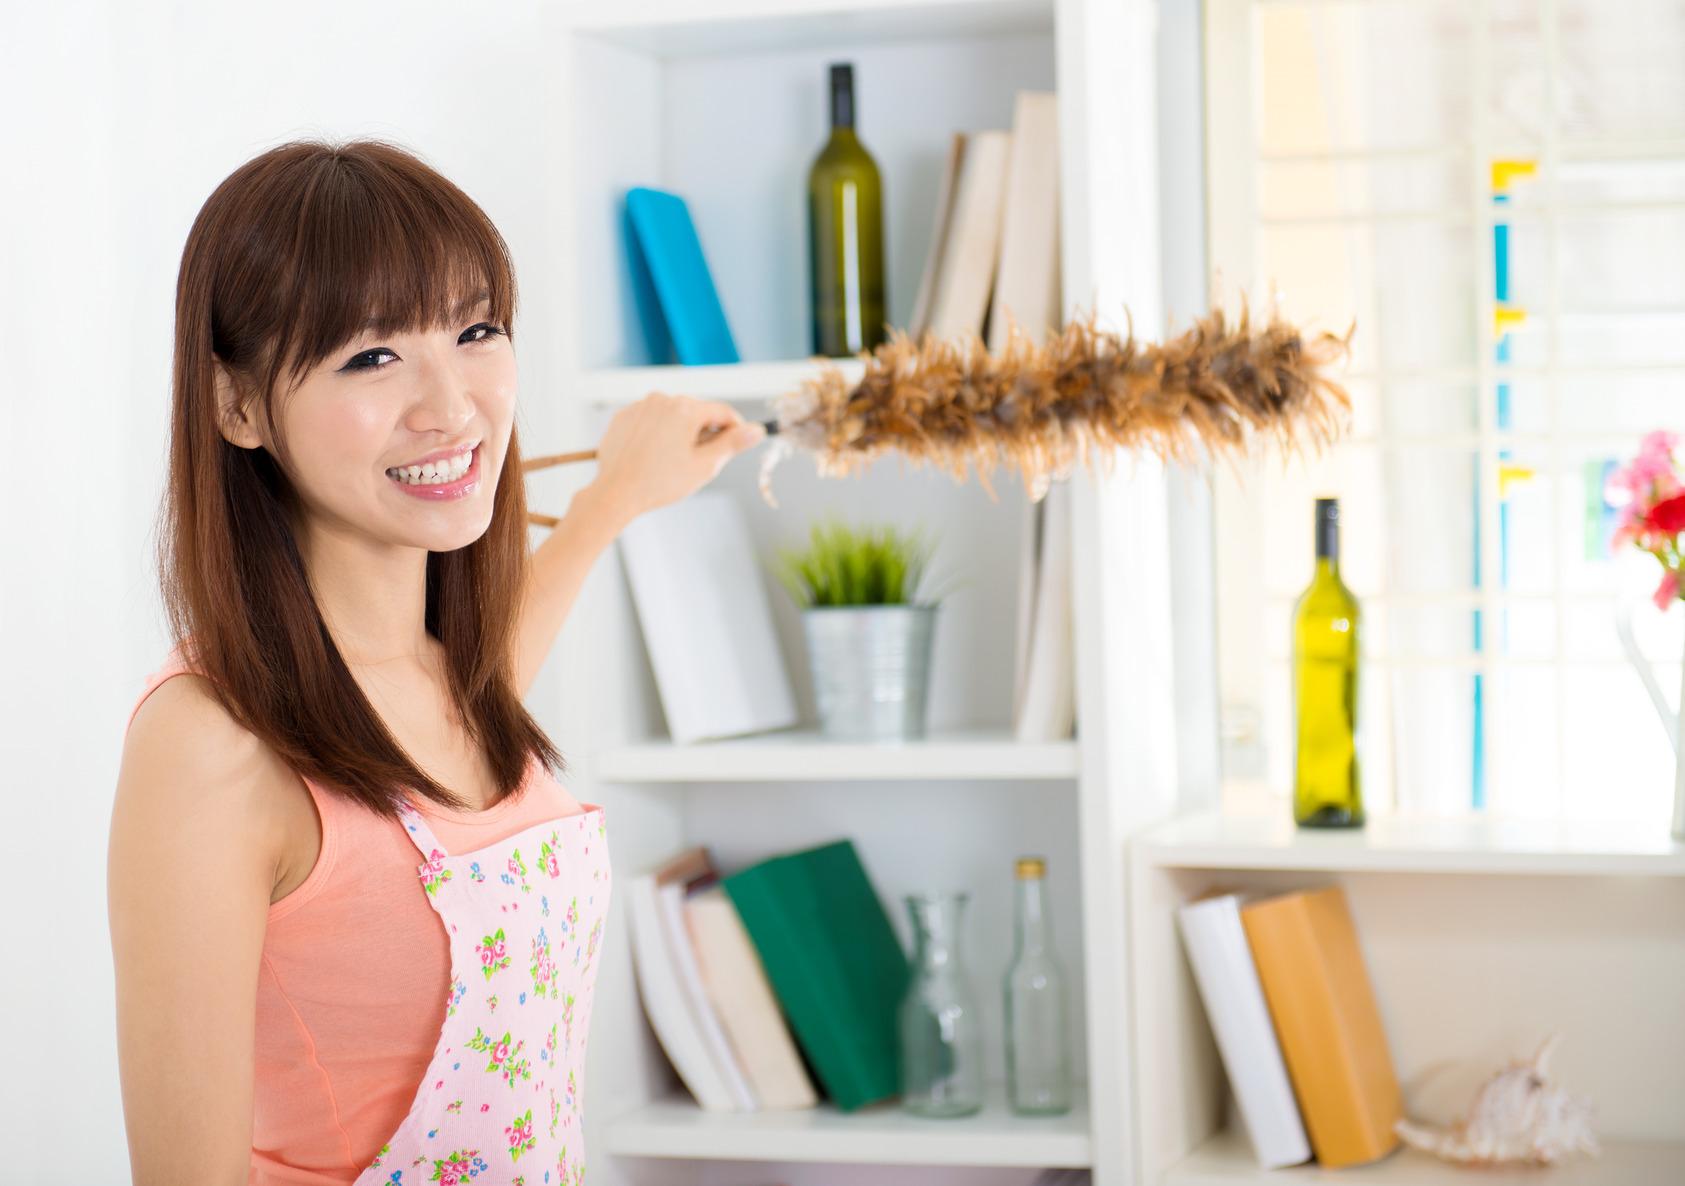 Should I Hire A Housekeeper Or A Nanny?